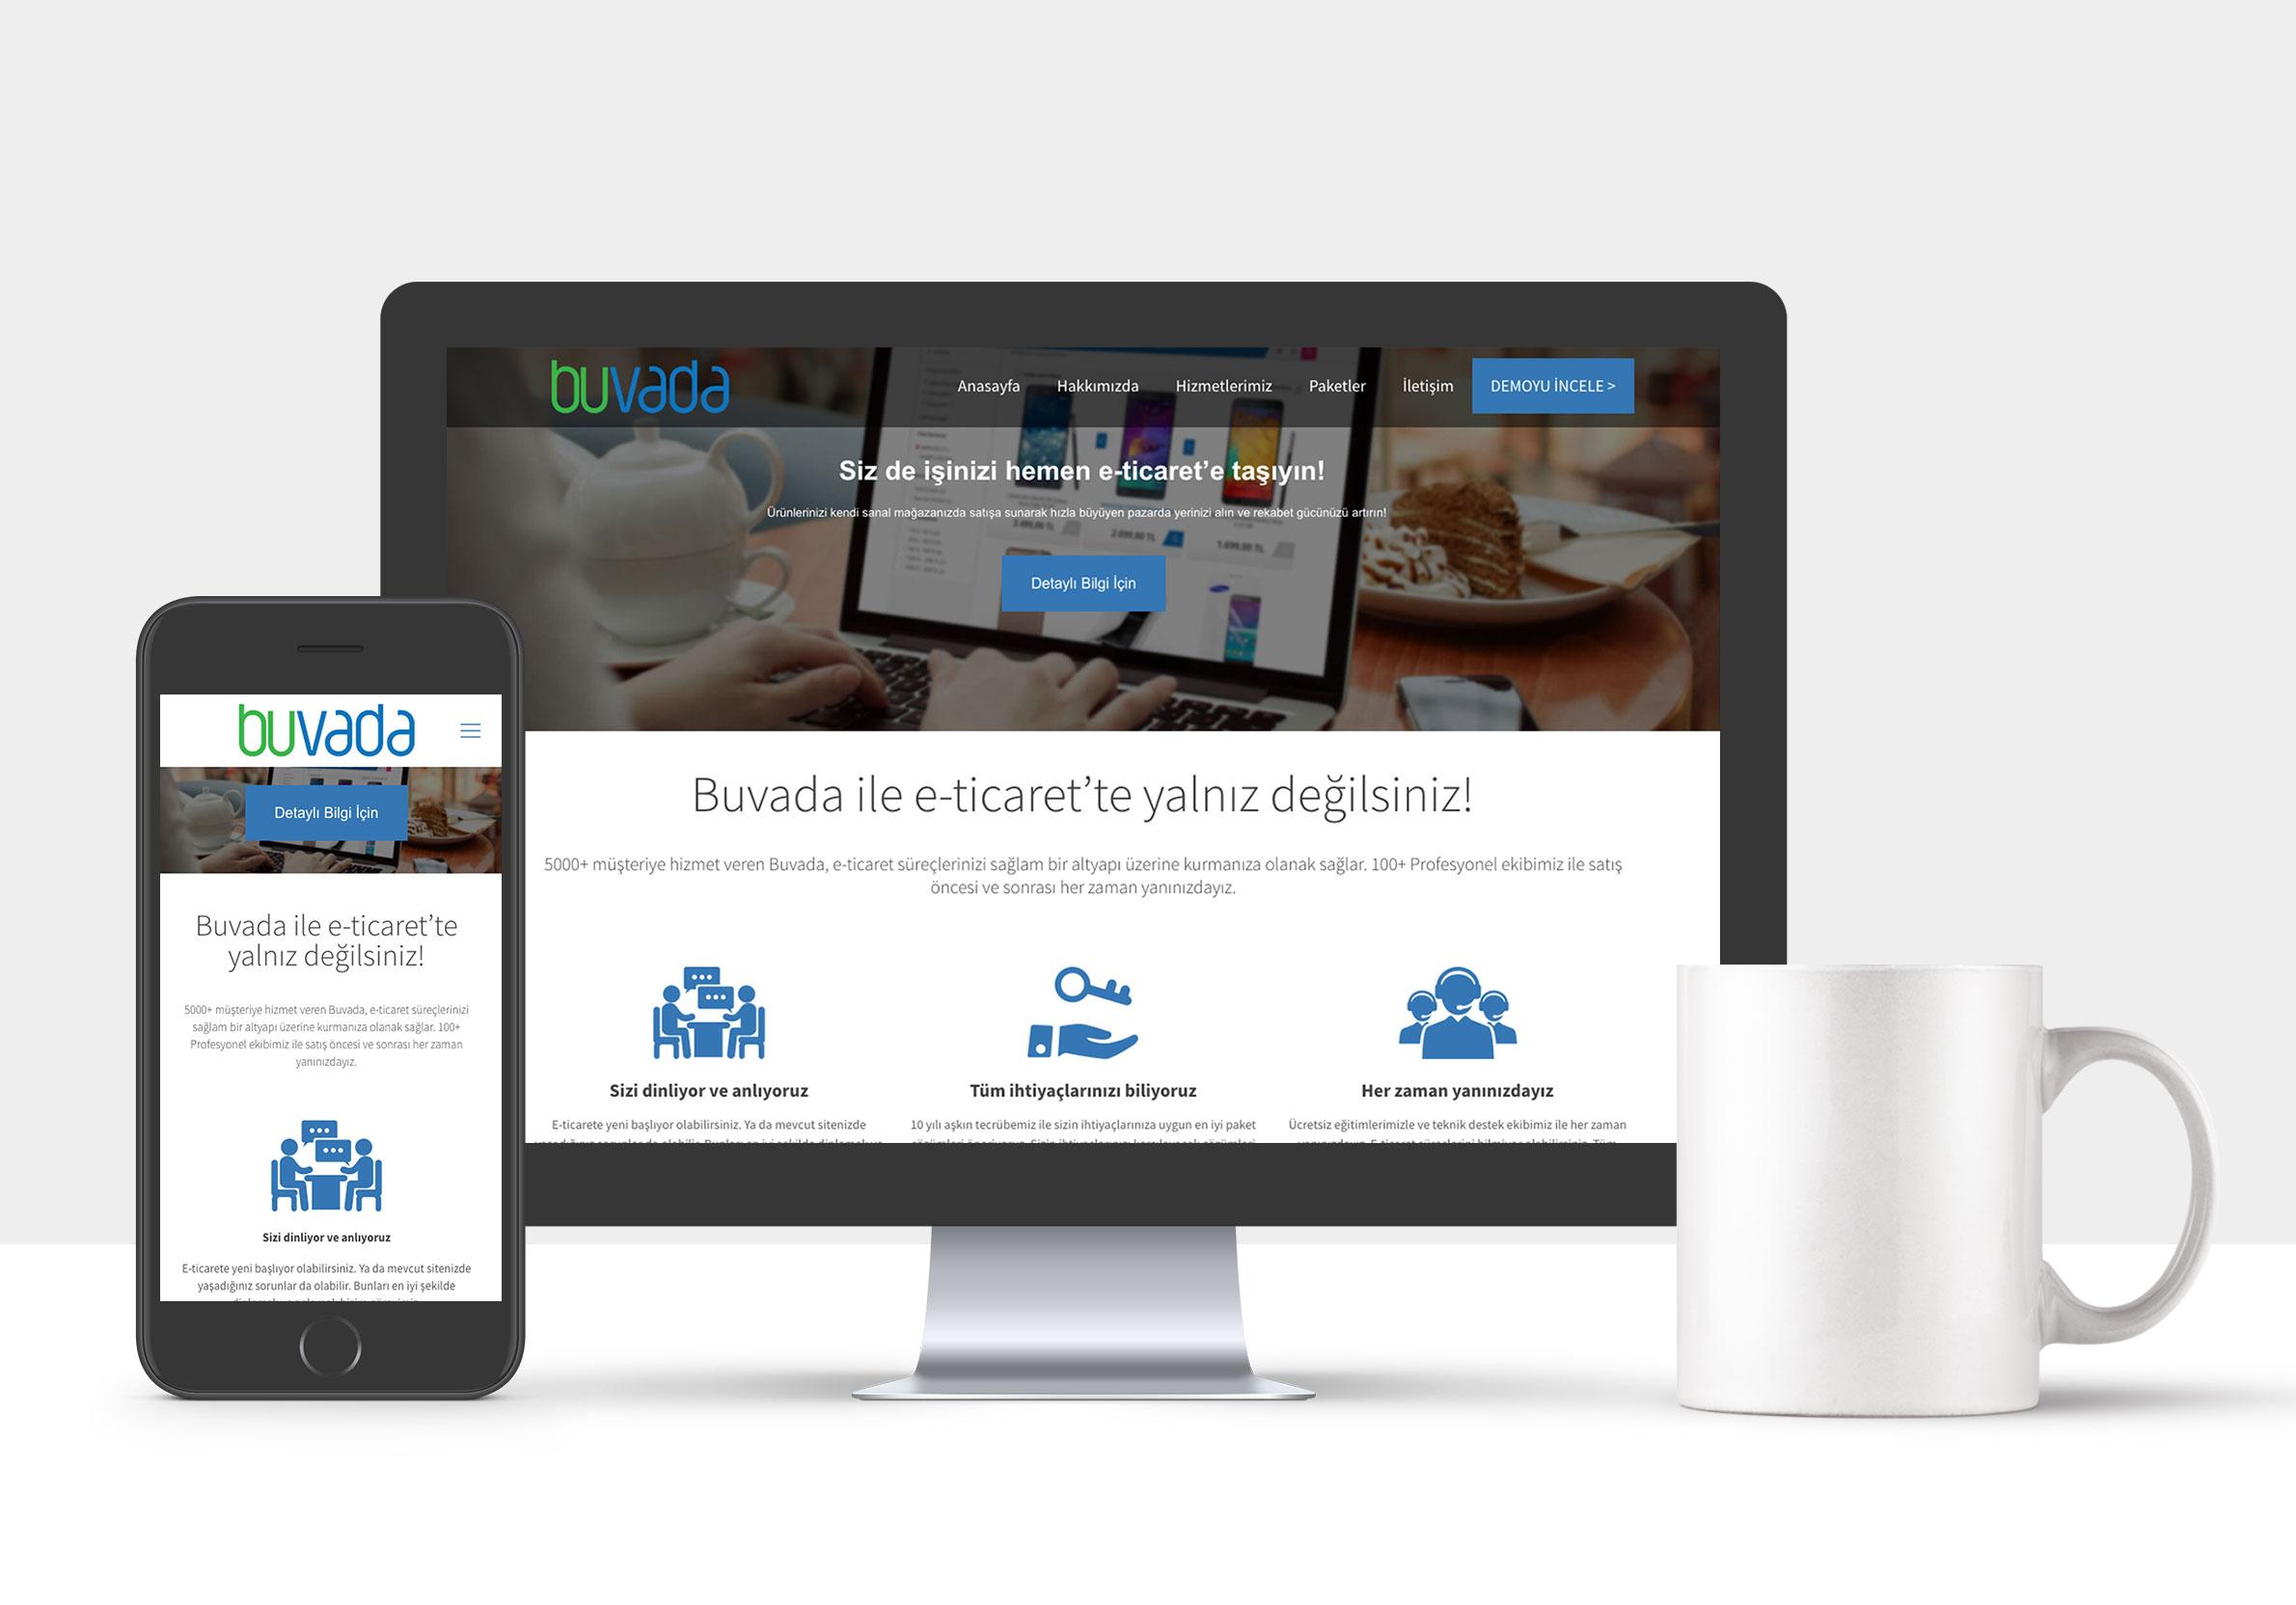 buvada-e-ticaret-kurumsal-web-tasarim